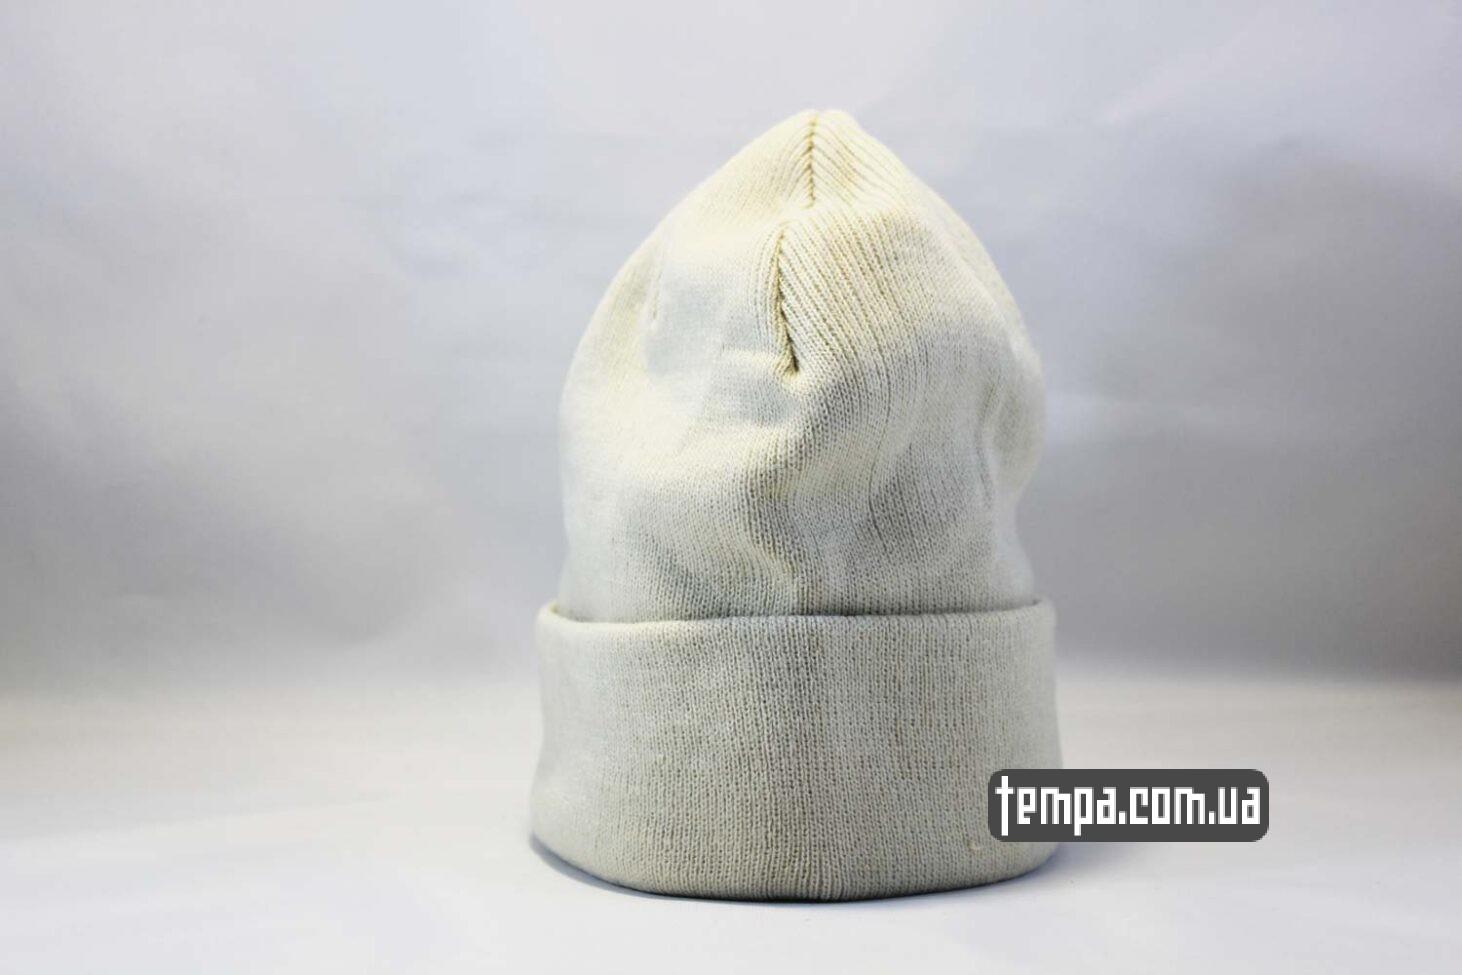 теплая зимняя двойная шапка beanie чисто белая однотонная без логотипов ASOS HM